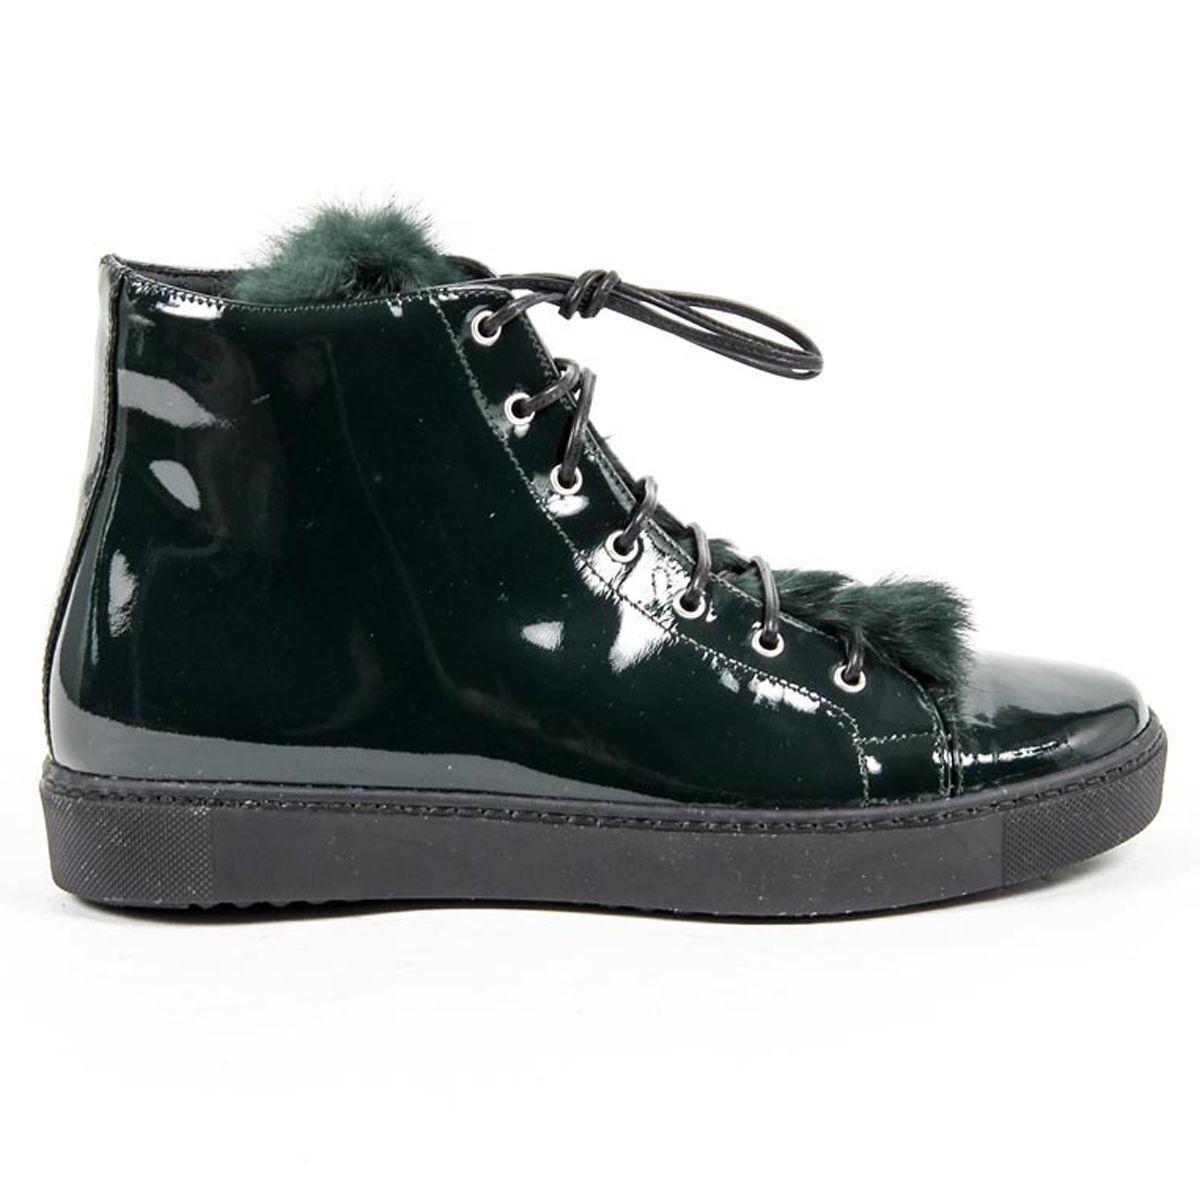 Versace 19.69 Abbigliamento Sportivo Srl Milano Italia Womens High Sneaker 312070 VERNICE VERDE